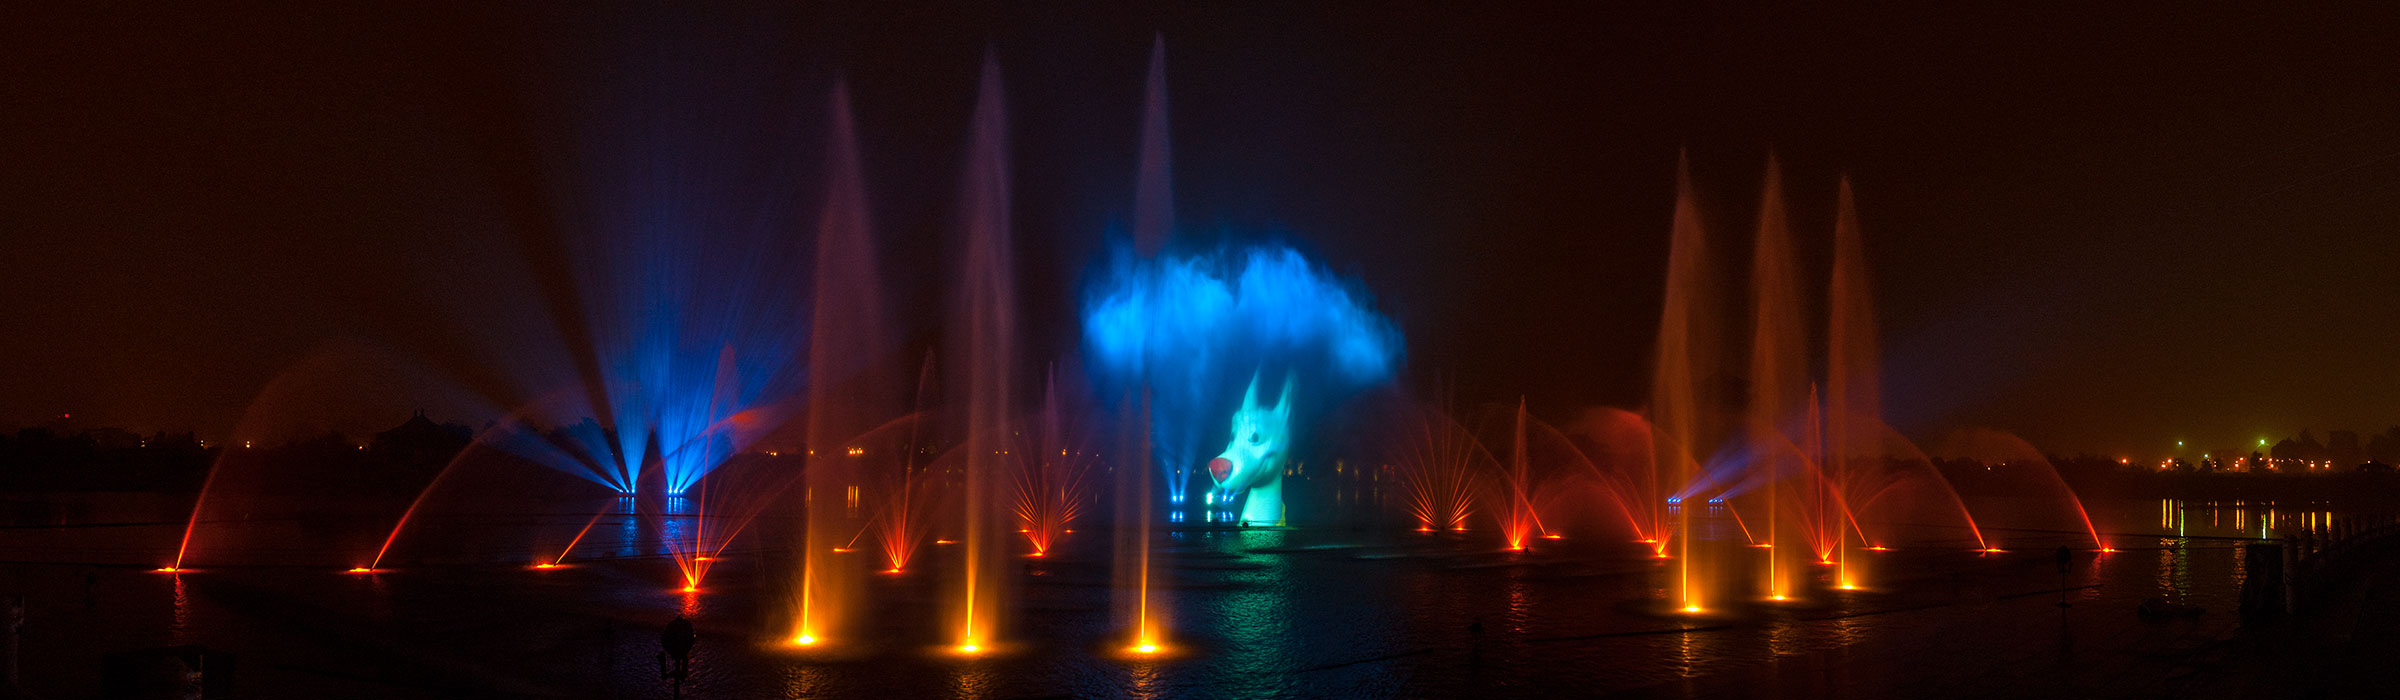 Schau im Themenpark Tang-Paradise in Xian